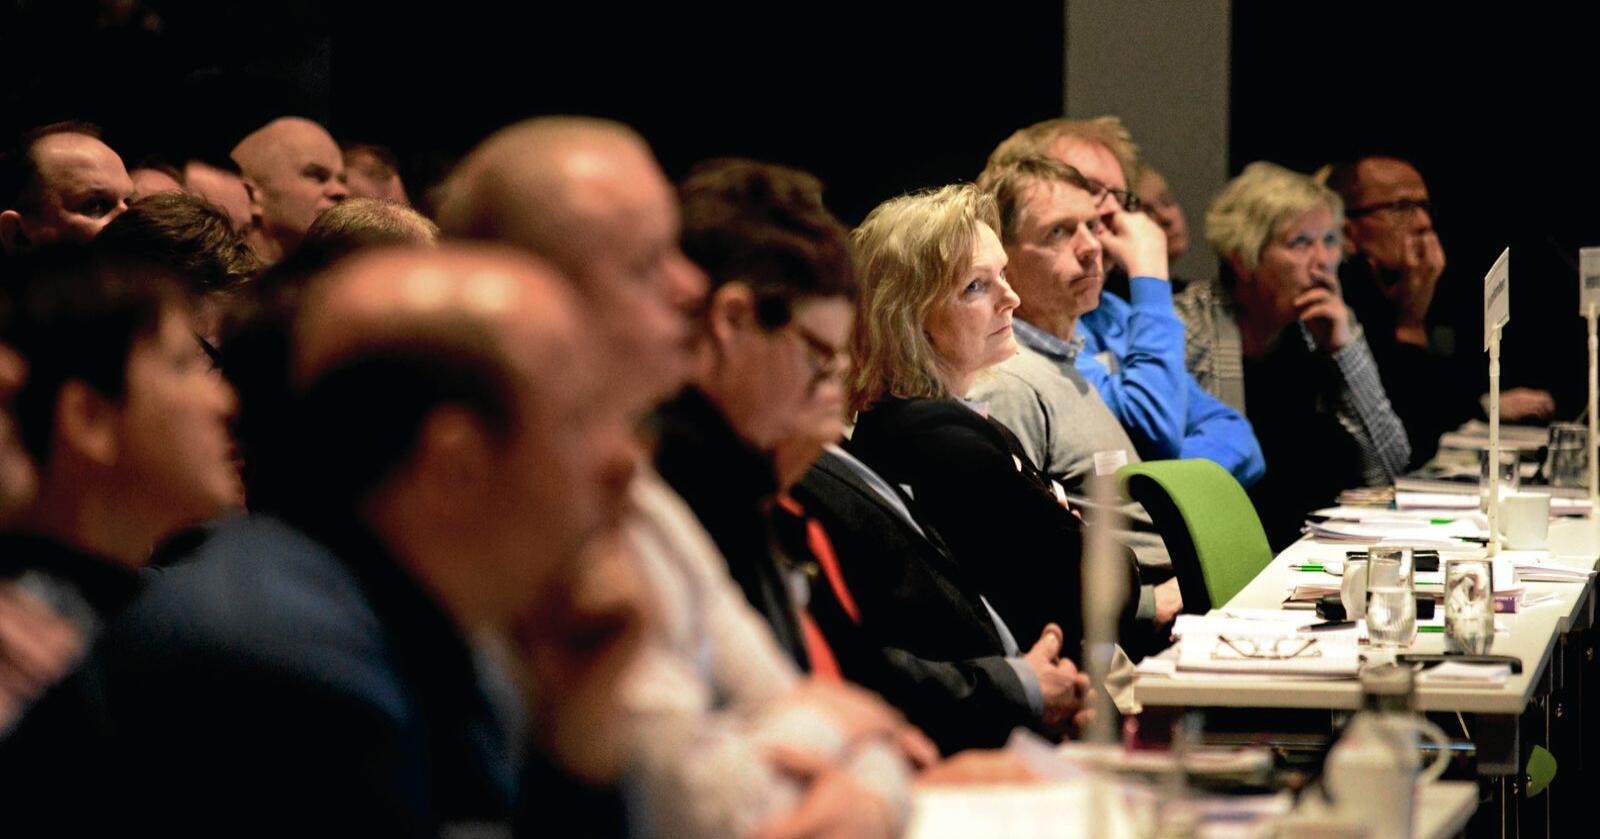 Får kritikk: Styret i Nortura, her ved styreleiar Trine Hasvang Vaag under årsmøtet i april 2019. Foto: Siri Juell Rasmussen